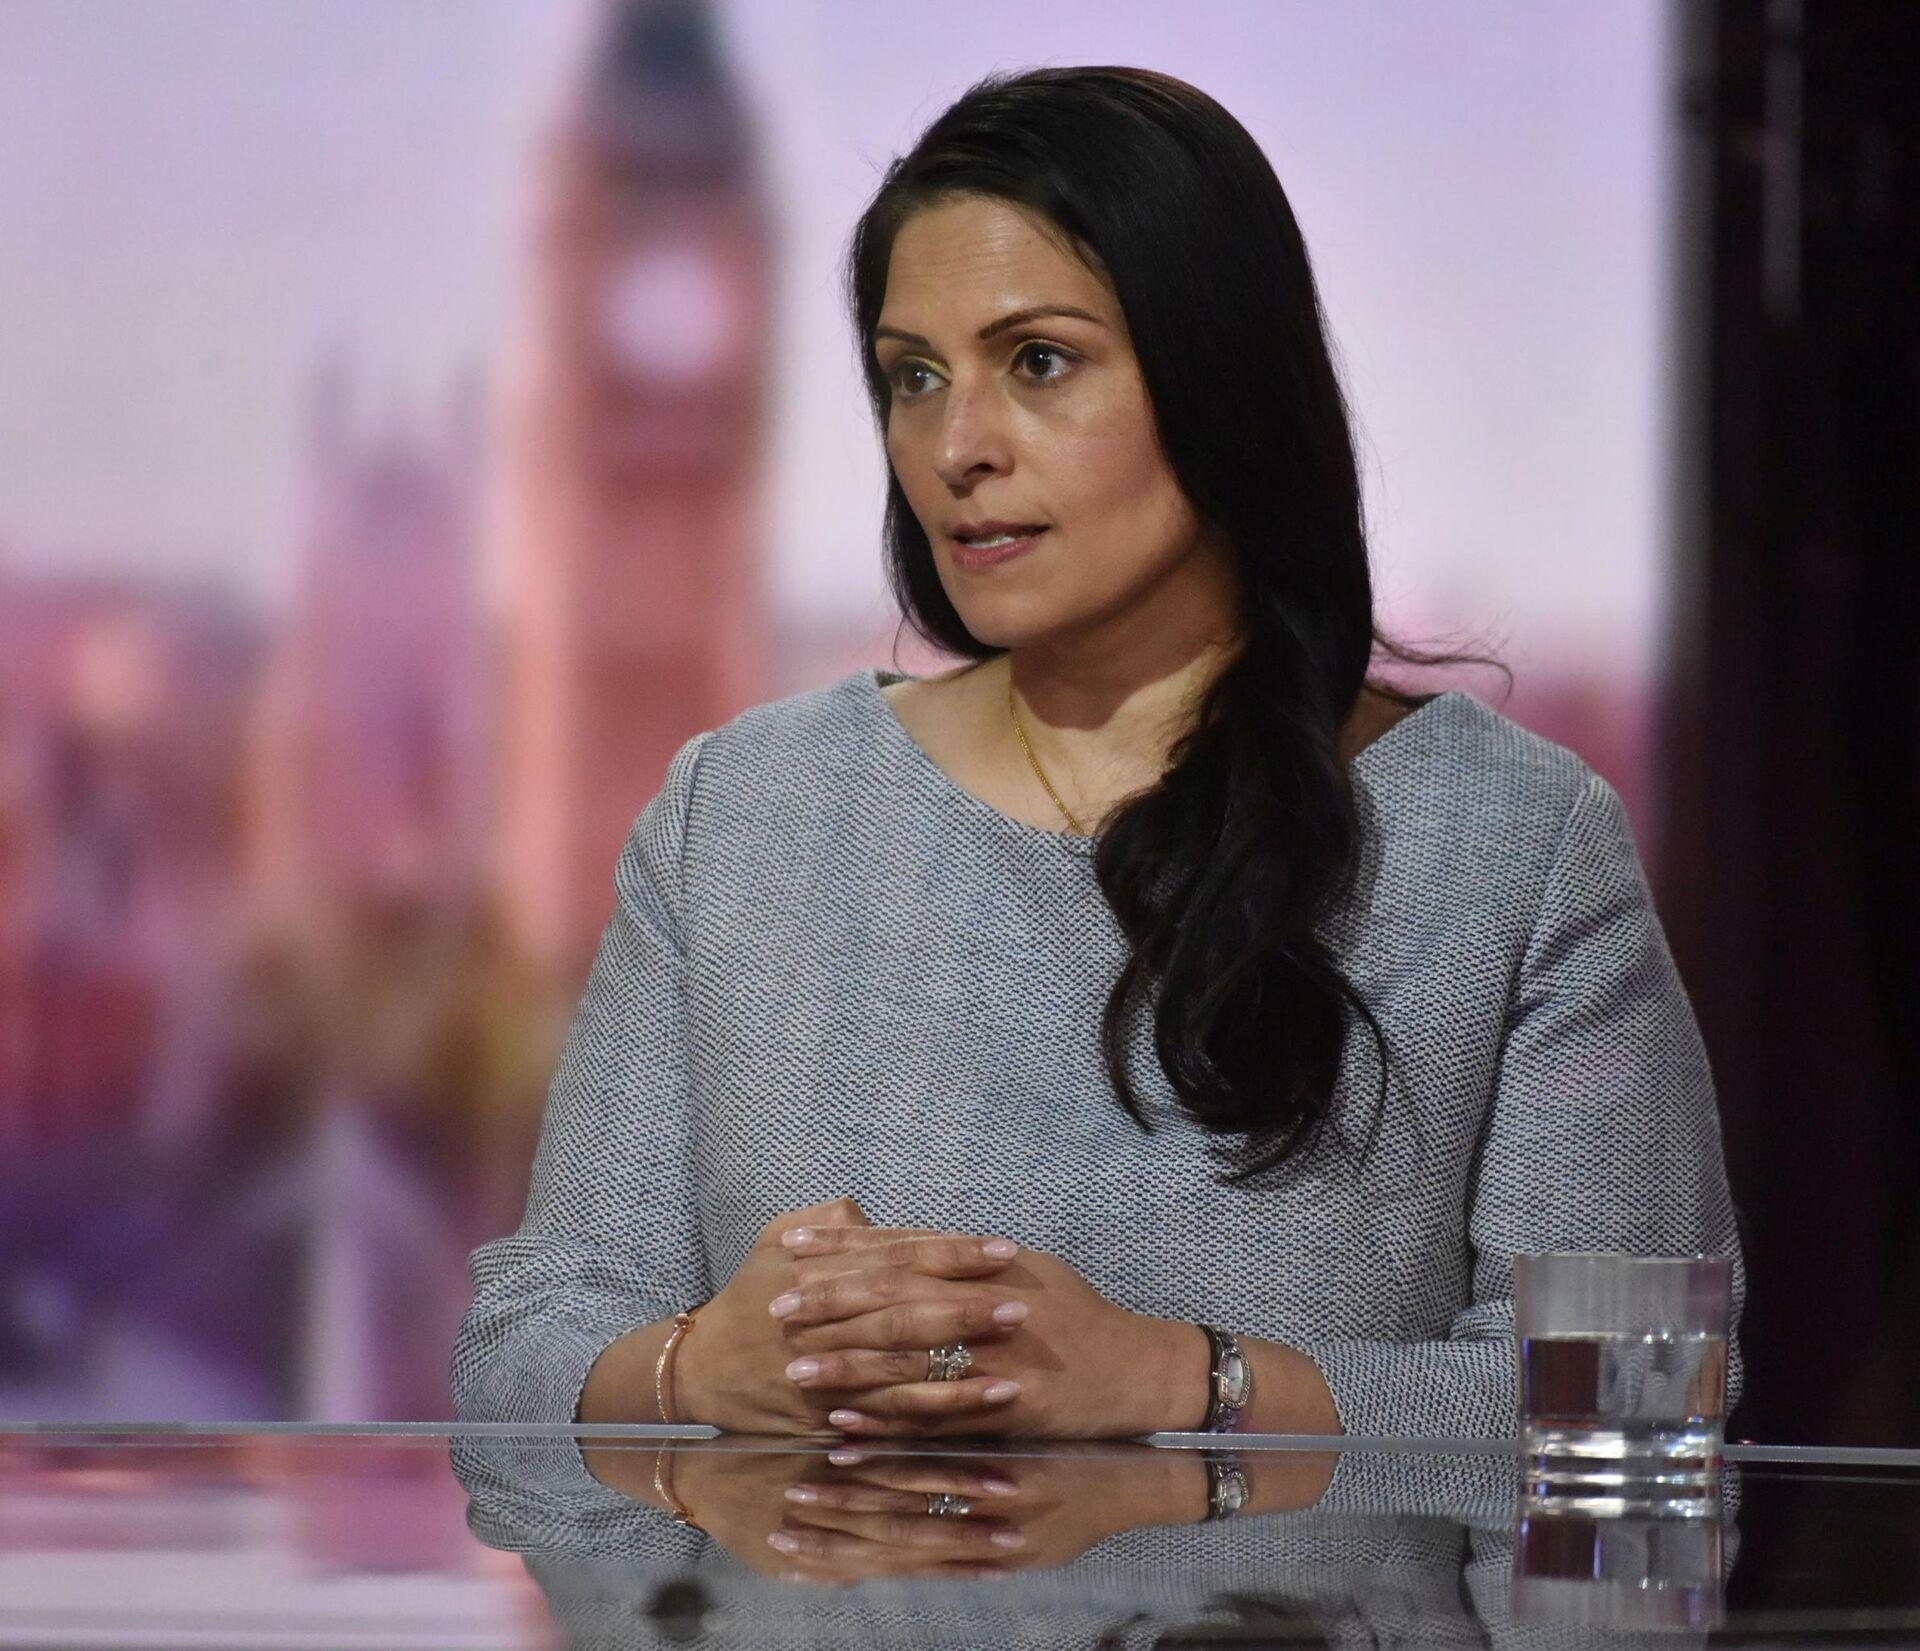 Britain's Home Secretary Priti Patel appears on BBC TV's The Andrew Marr Show in London, Britain May 23, 2021 - Sputnik International, 1920, 15.09.2021